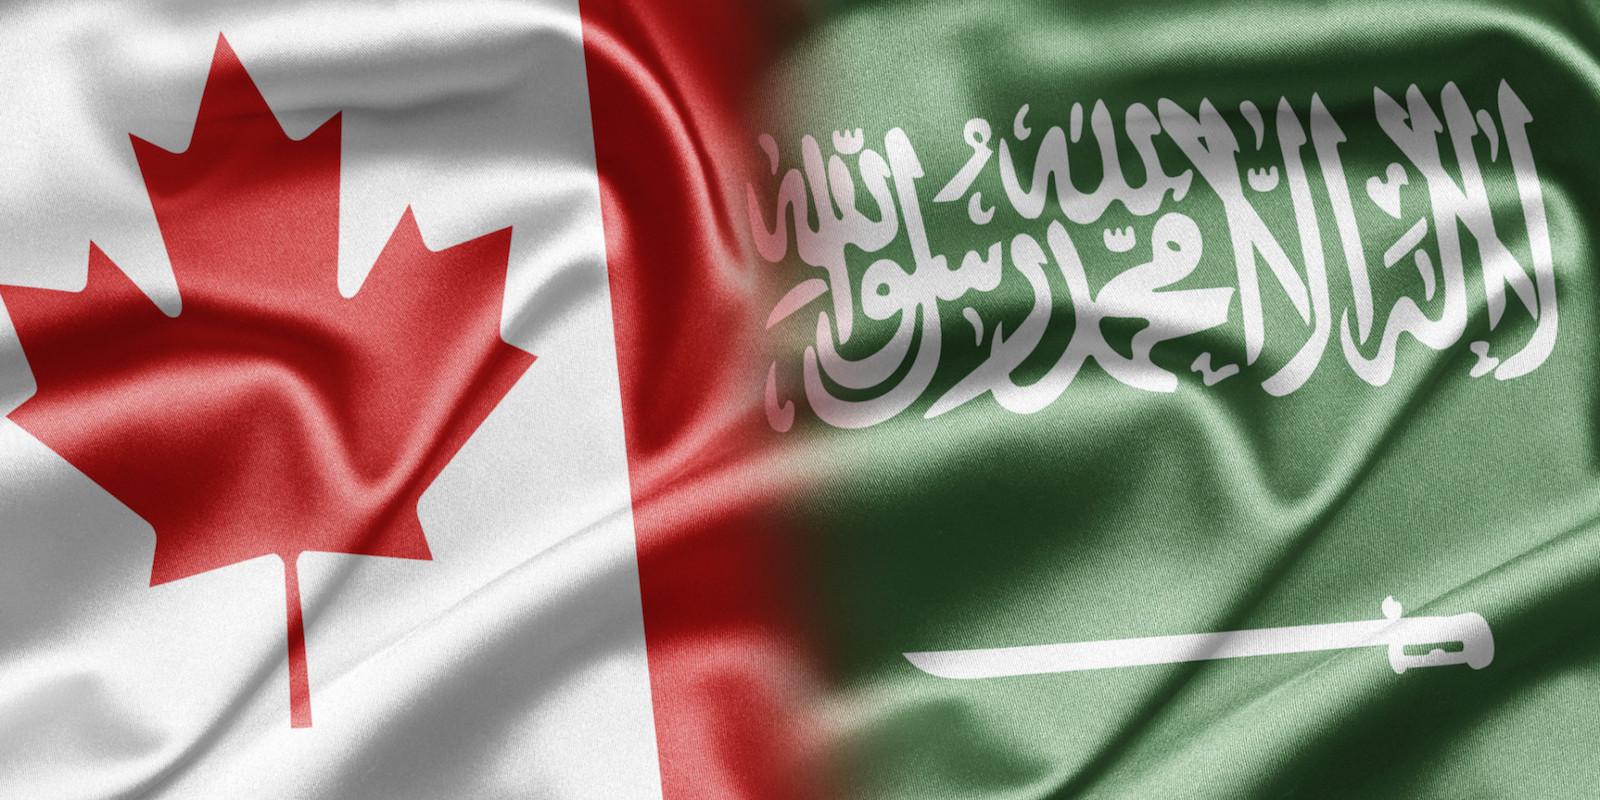 o-CANADA-SAUDI-ARABIA- Canadians Keep Asking Questions About Saudi Arms Deal - MPC Journal - Erika Simpson